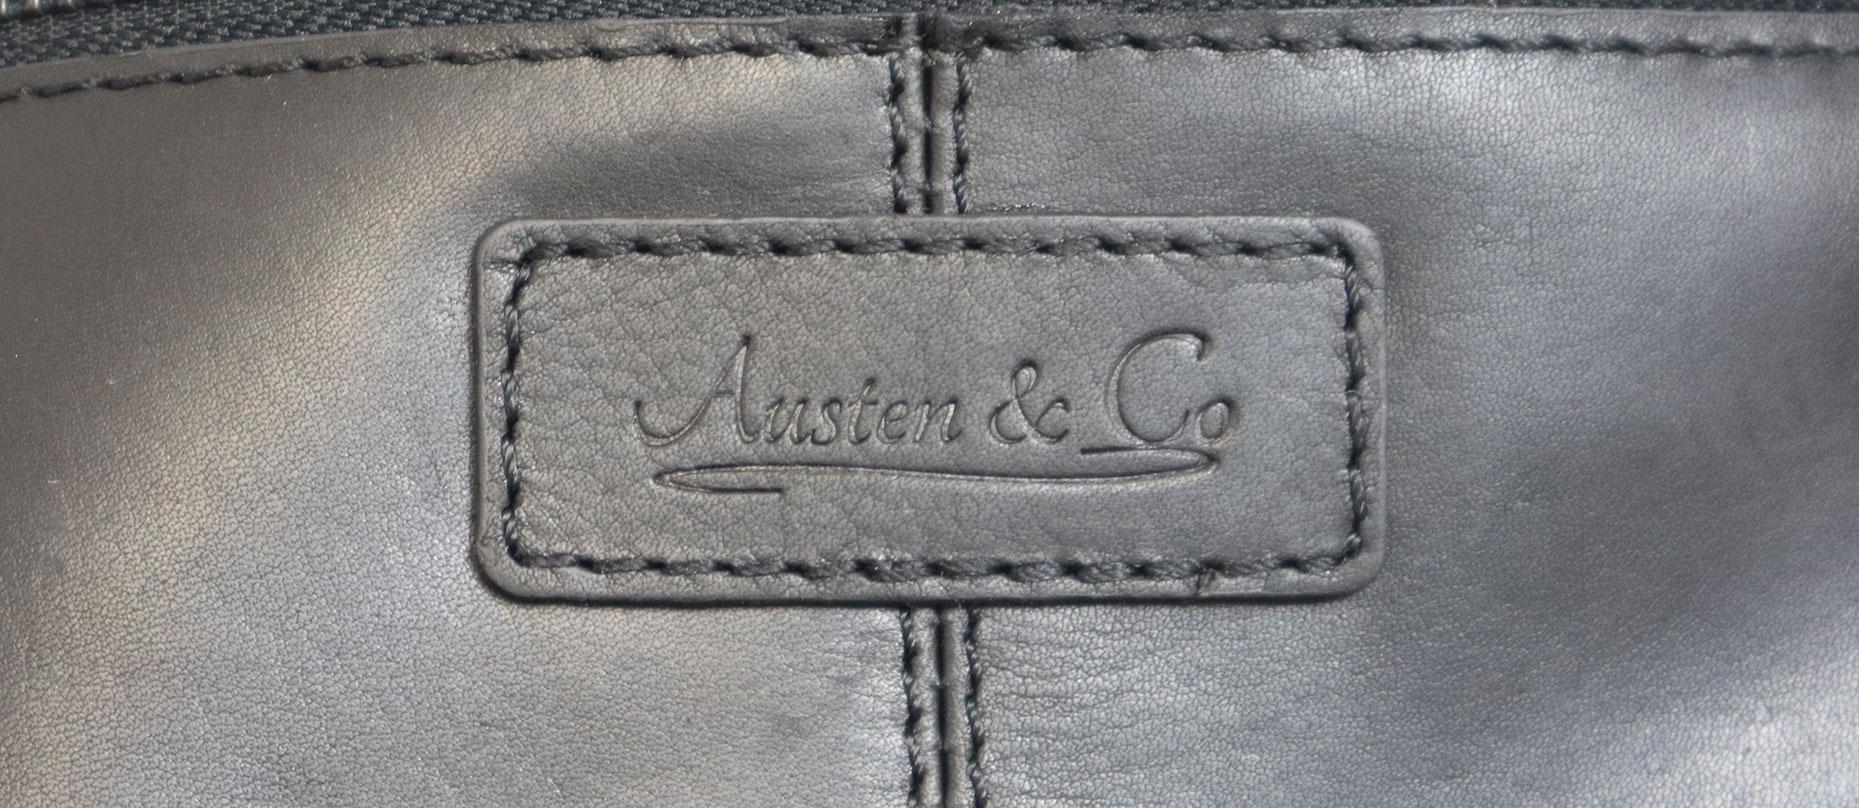 Black Body Bag Austen & Co Logo